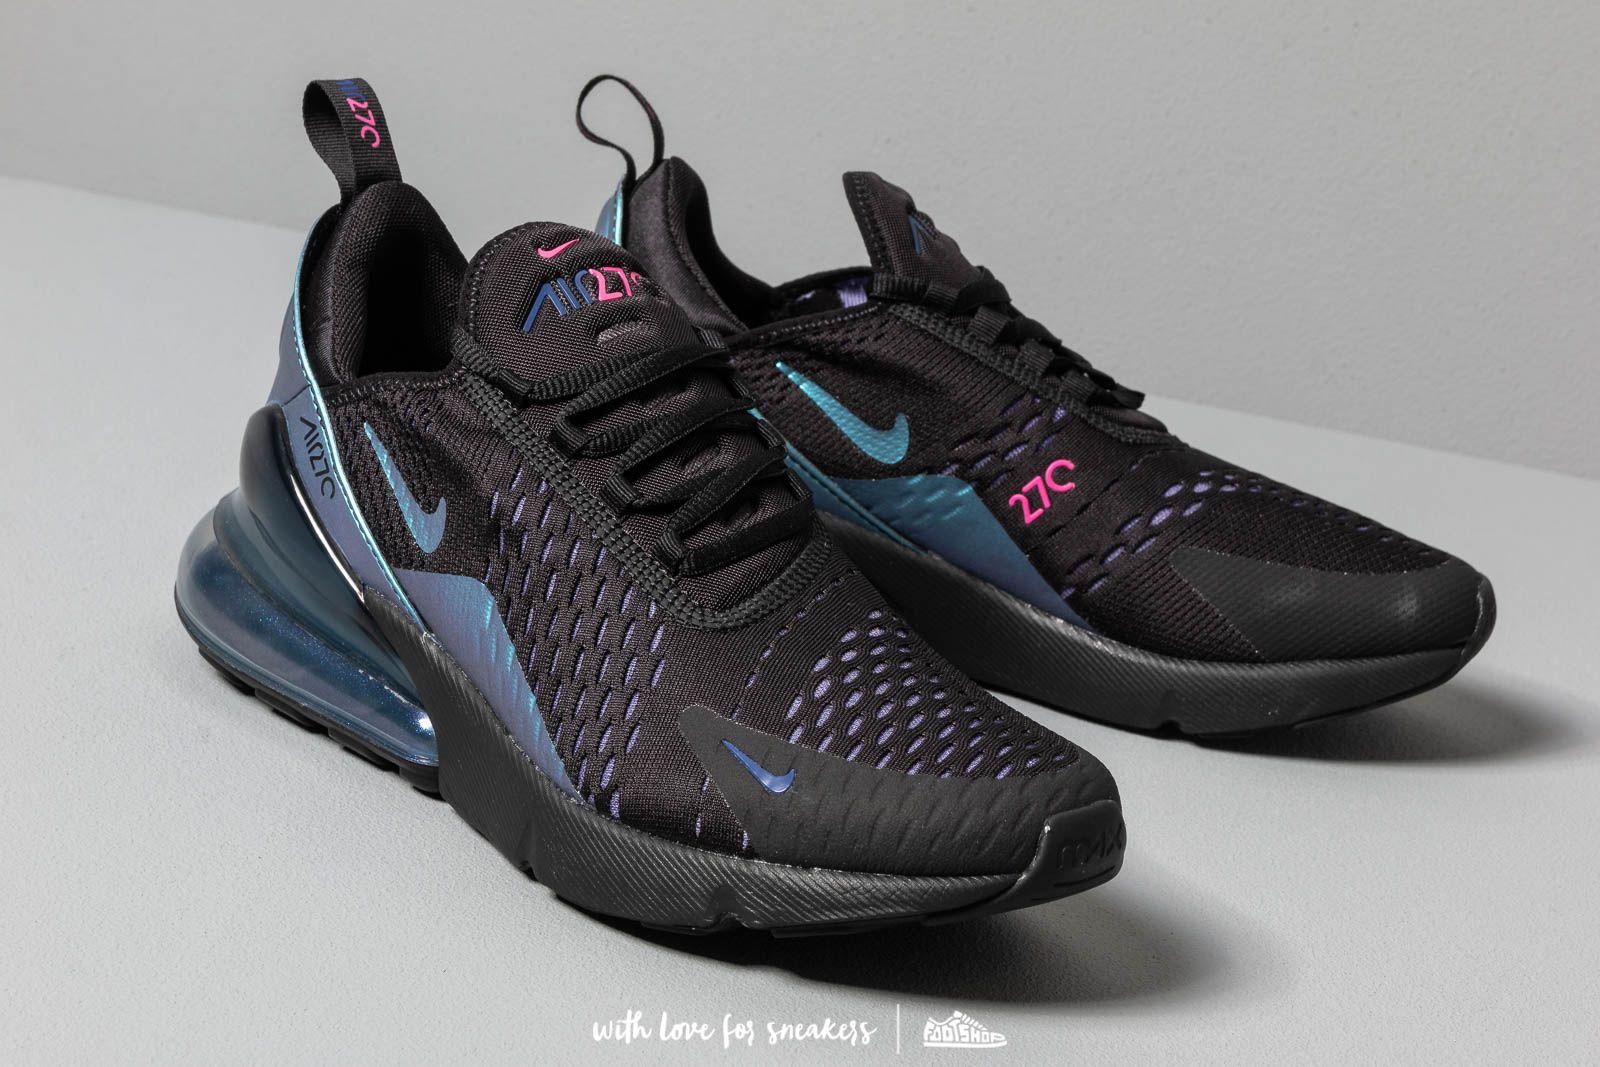 Nike Air Max 270 (BLACKLASER FUCHSIA REGENCY PURPLE